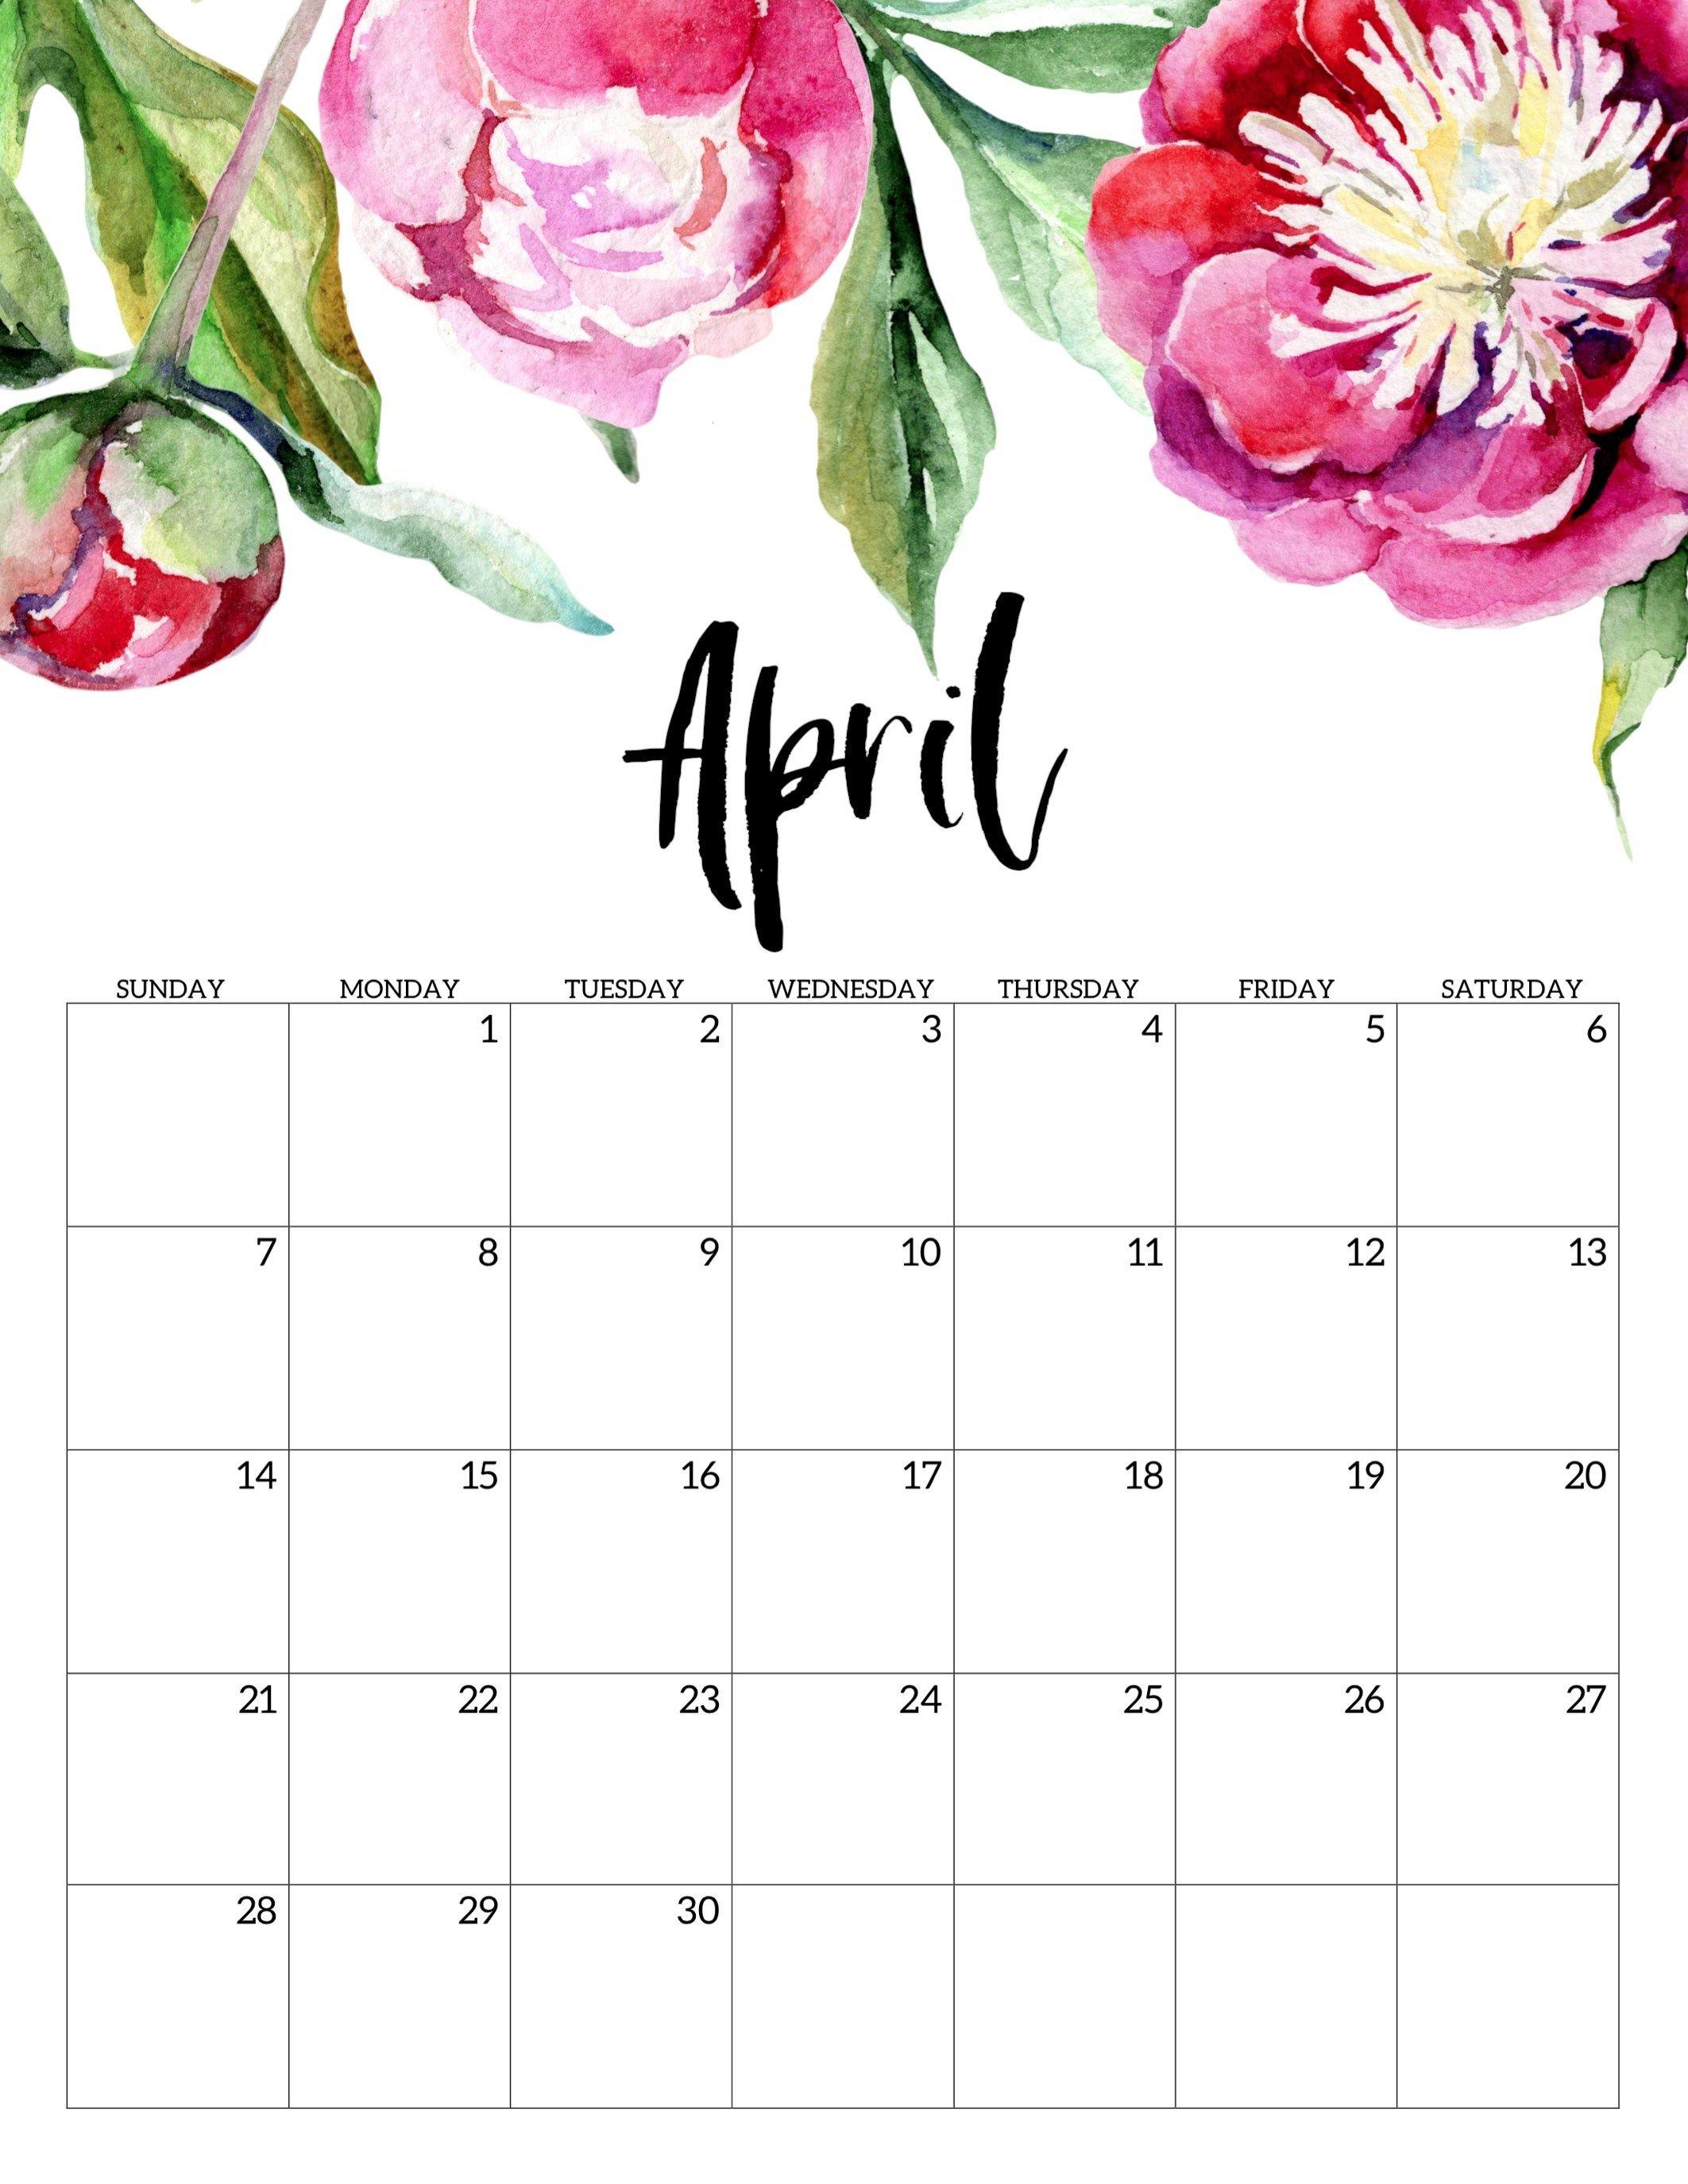 Free Printable Calendar 2019 – Floral | Печатные Календари Free No Download Printable Calendars